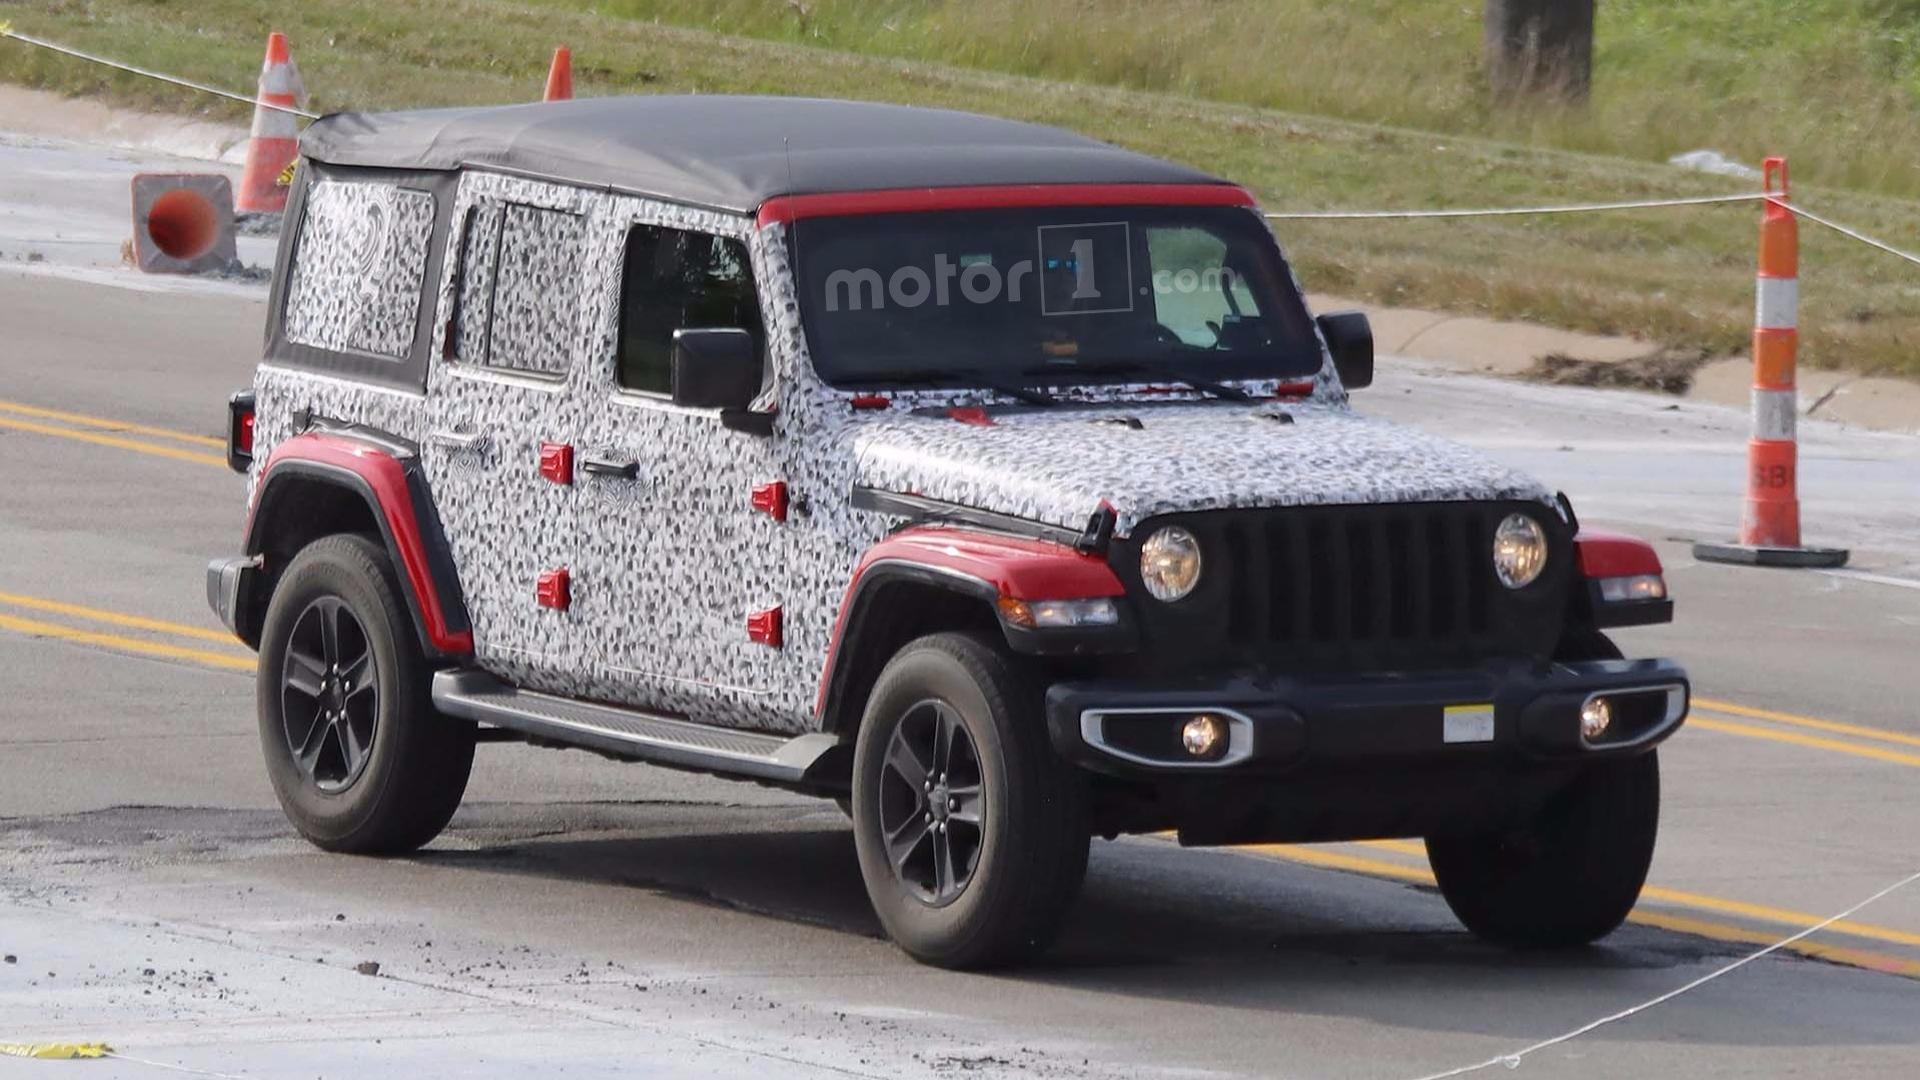 2018 - [Jeep] Wrangler - Page 3 Jeep-wrangler-sahara-spy-photo